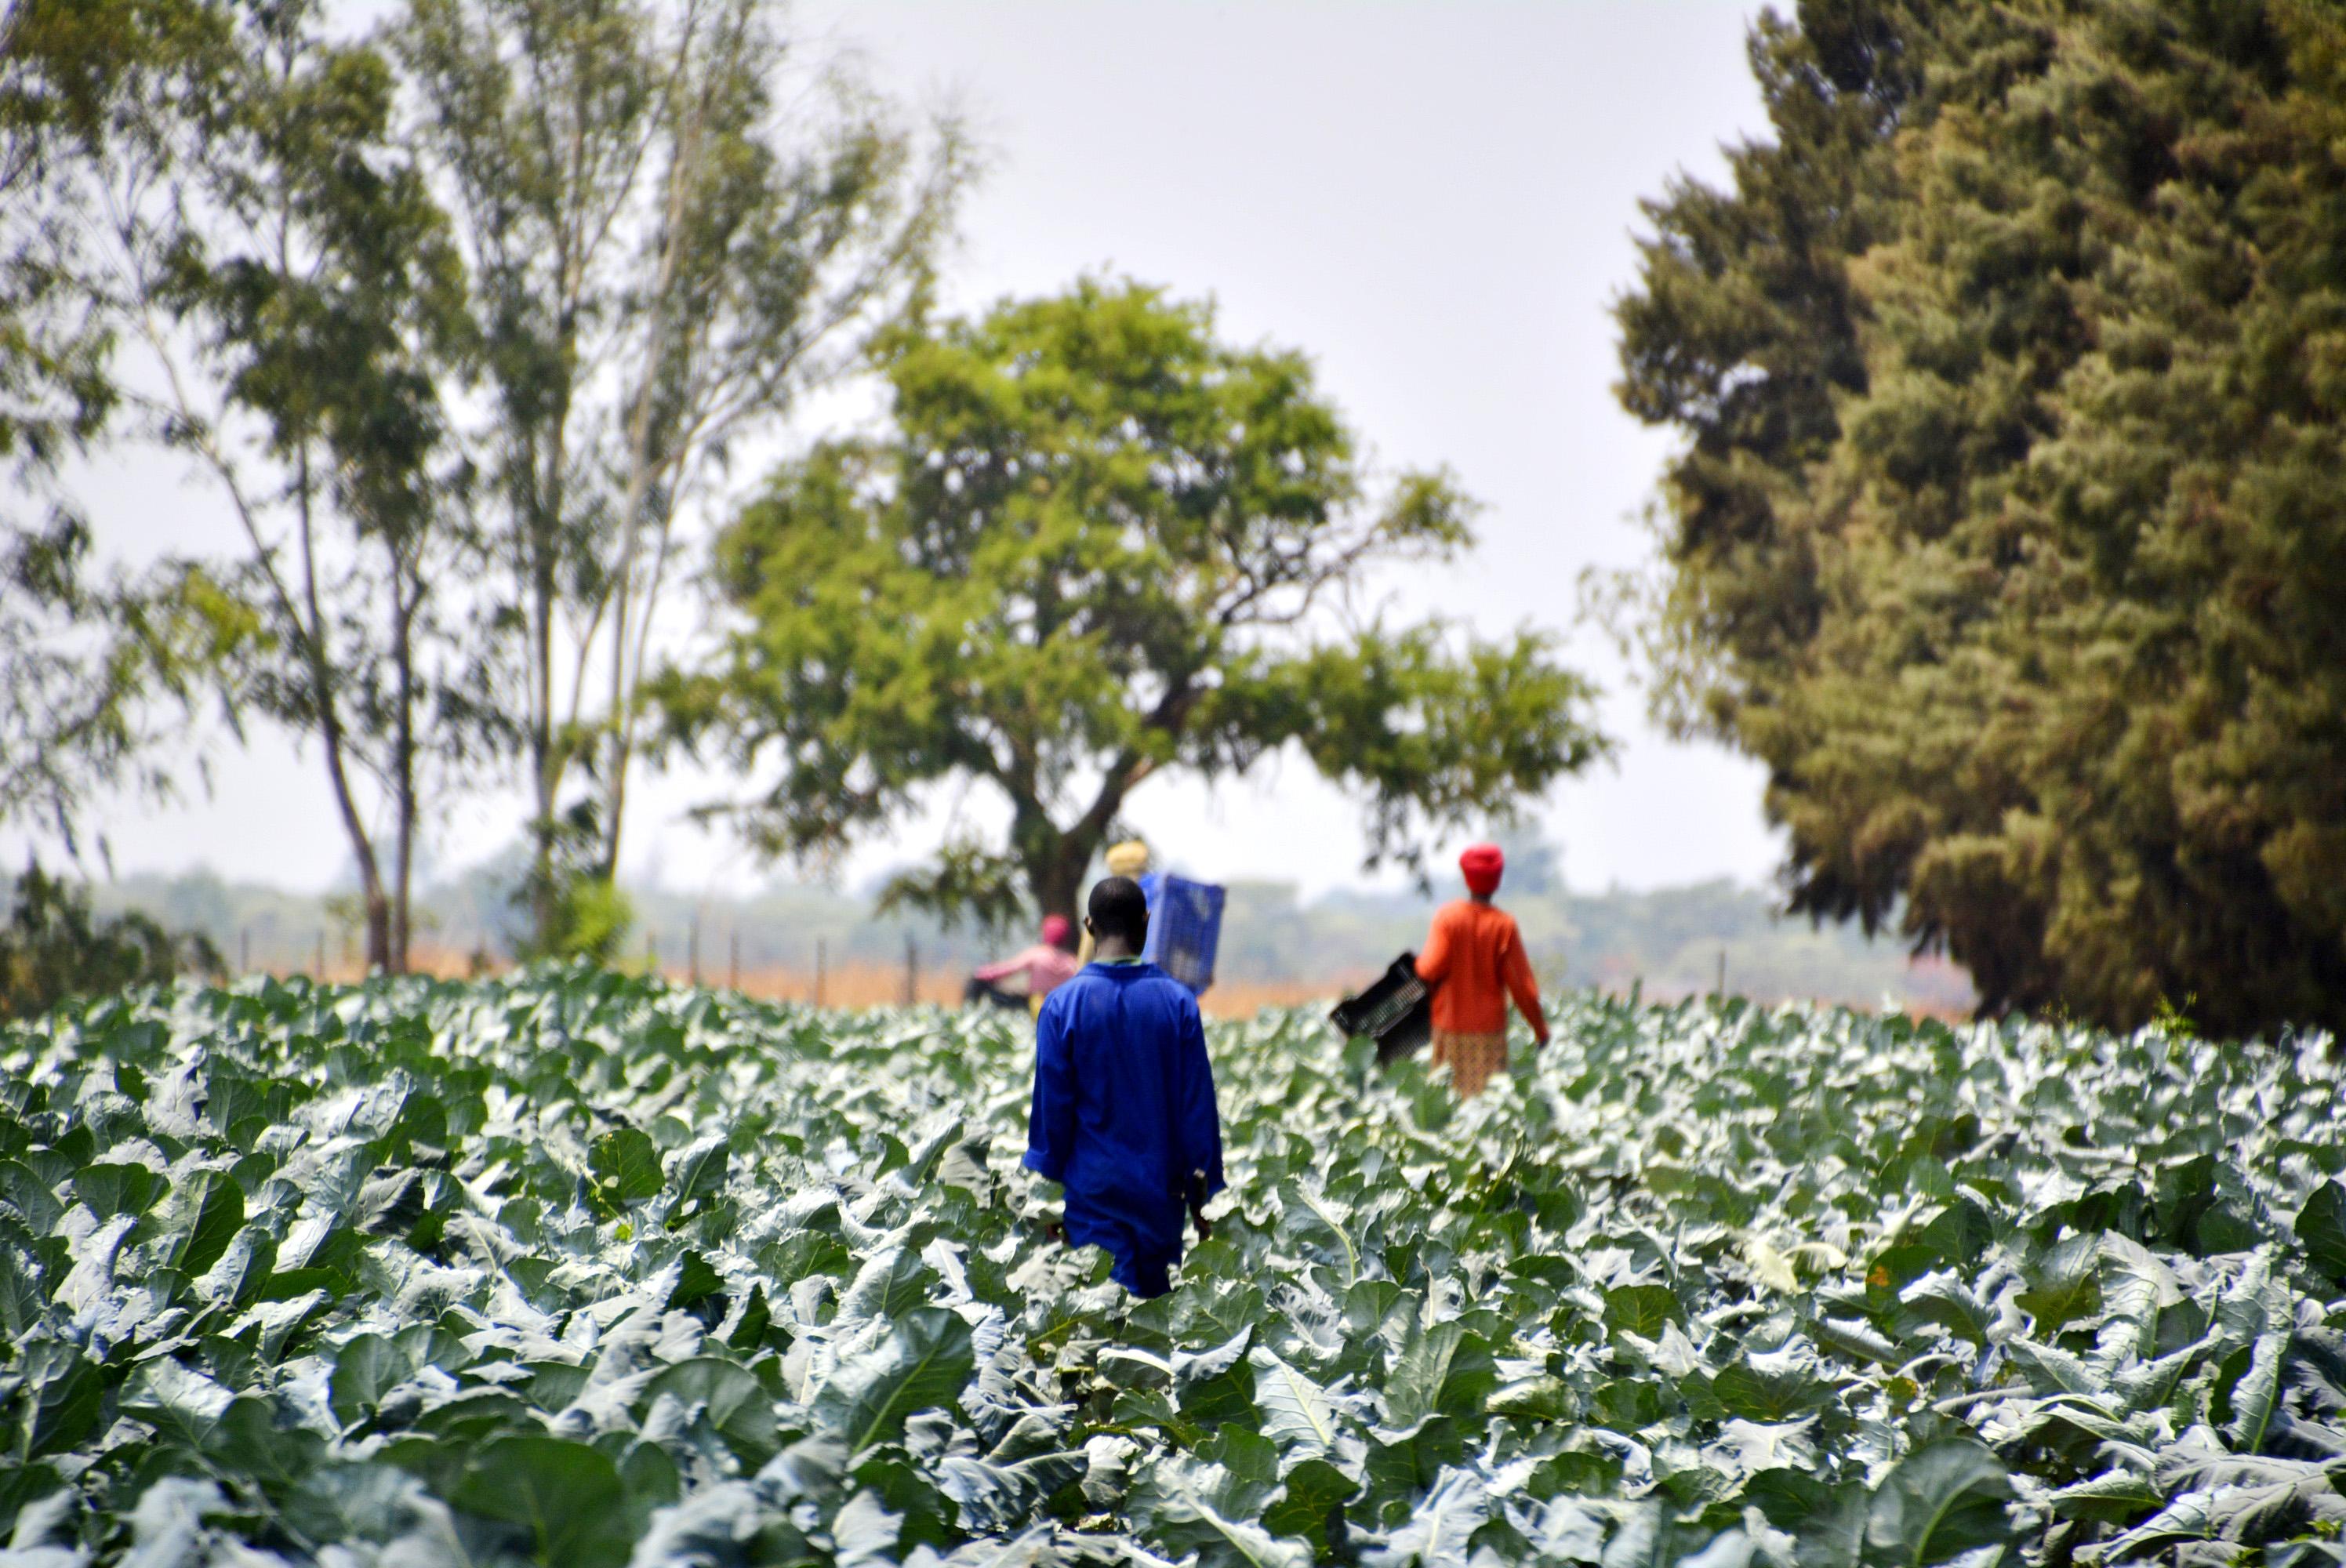 Arbetstagare på plantage i Zambia